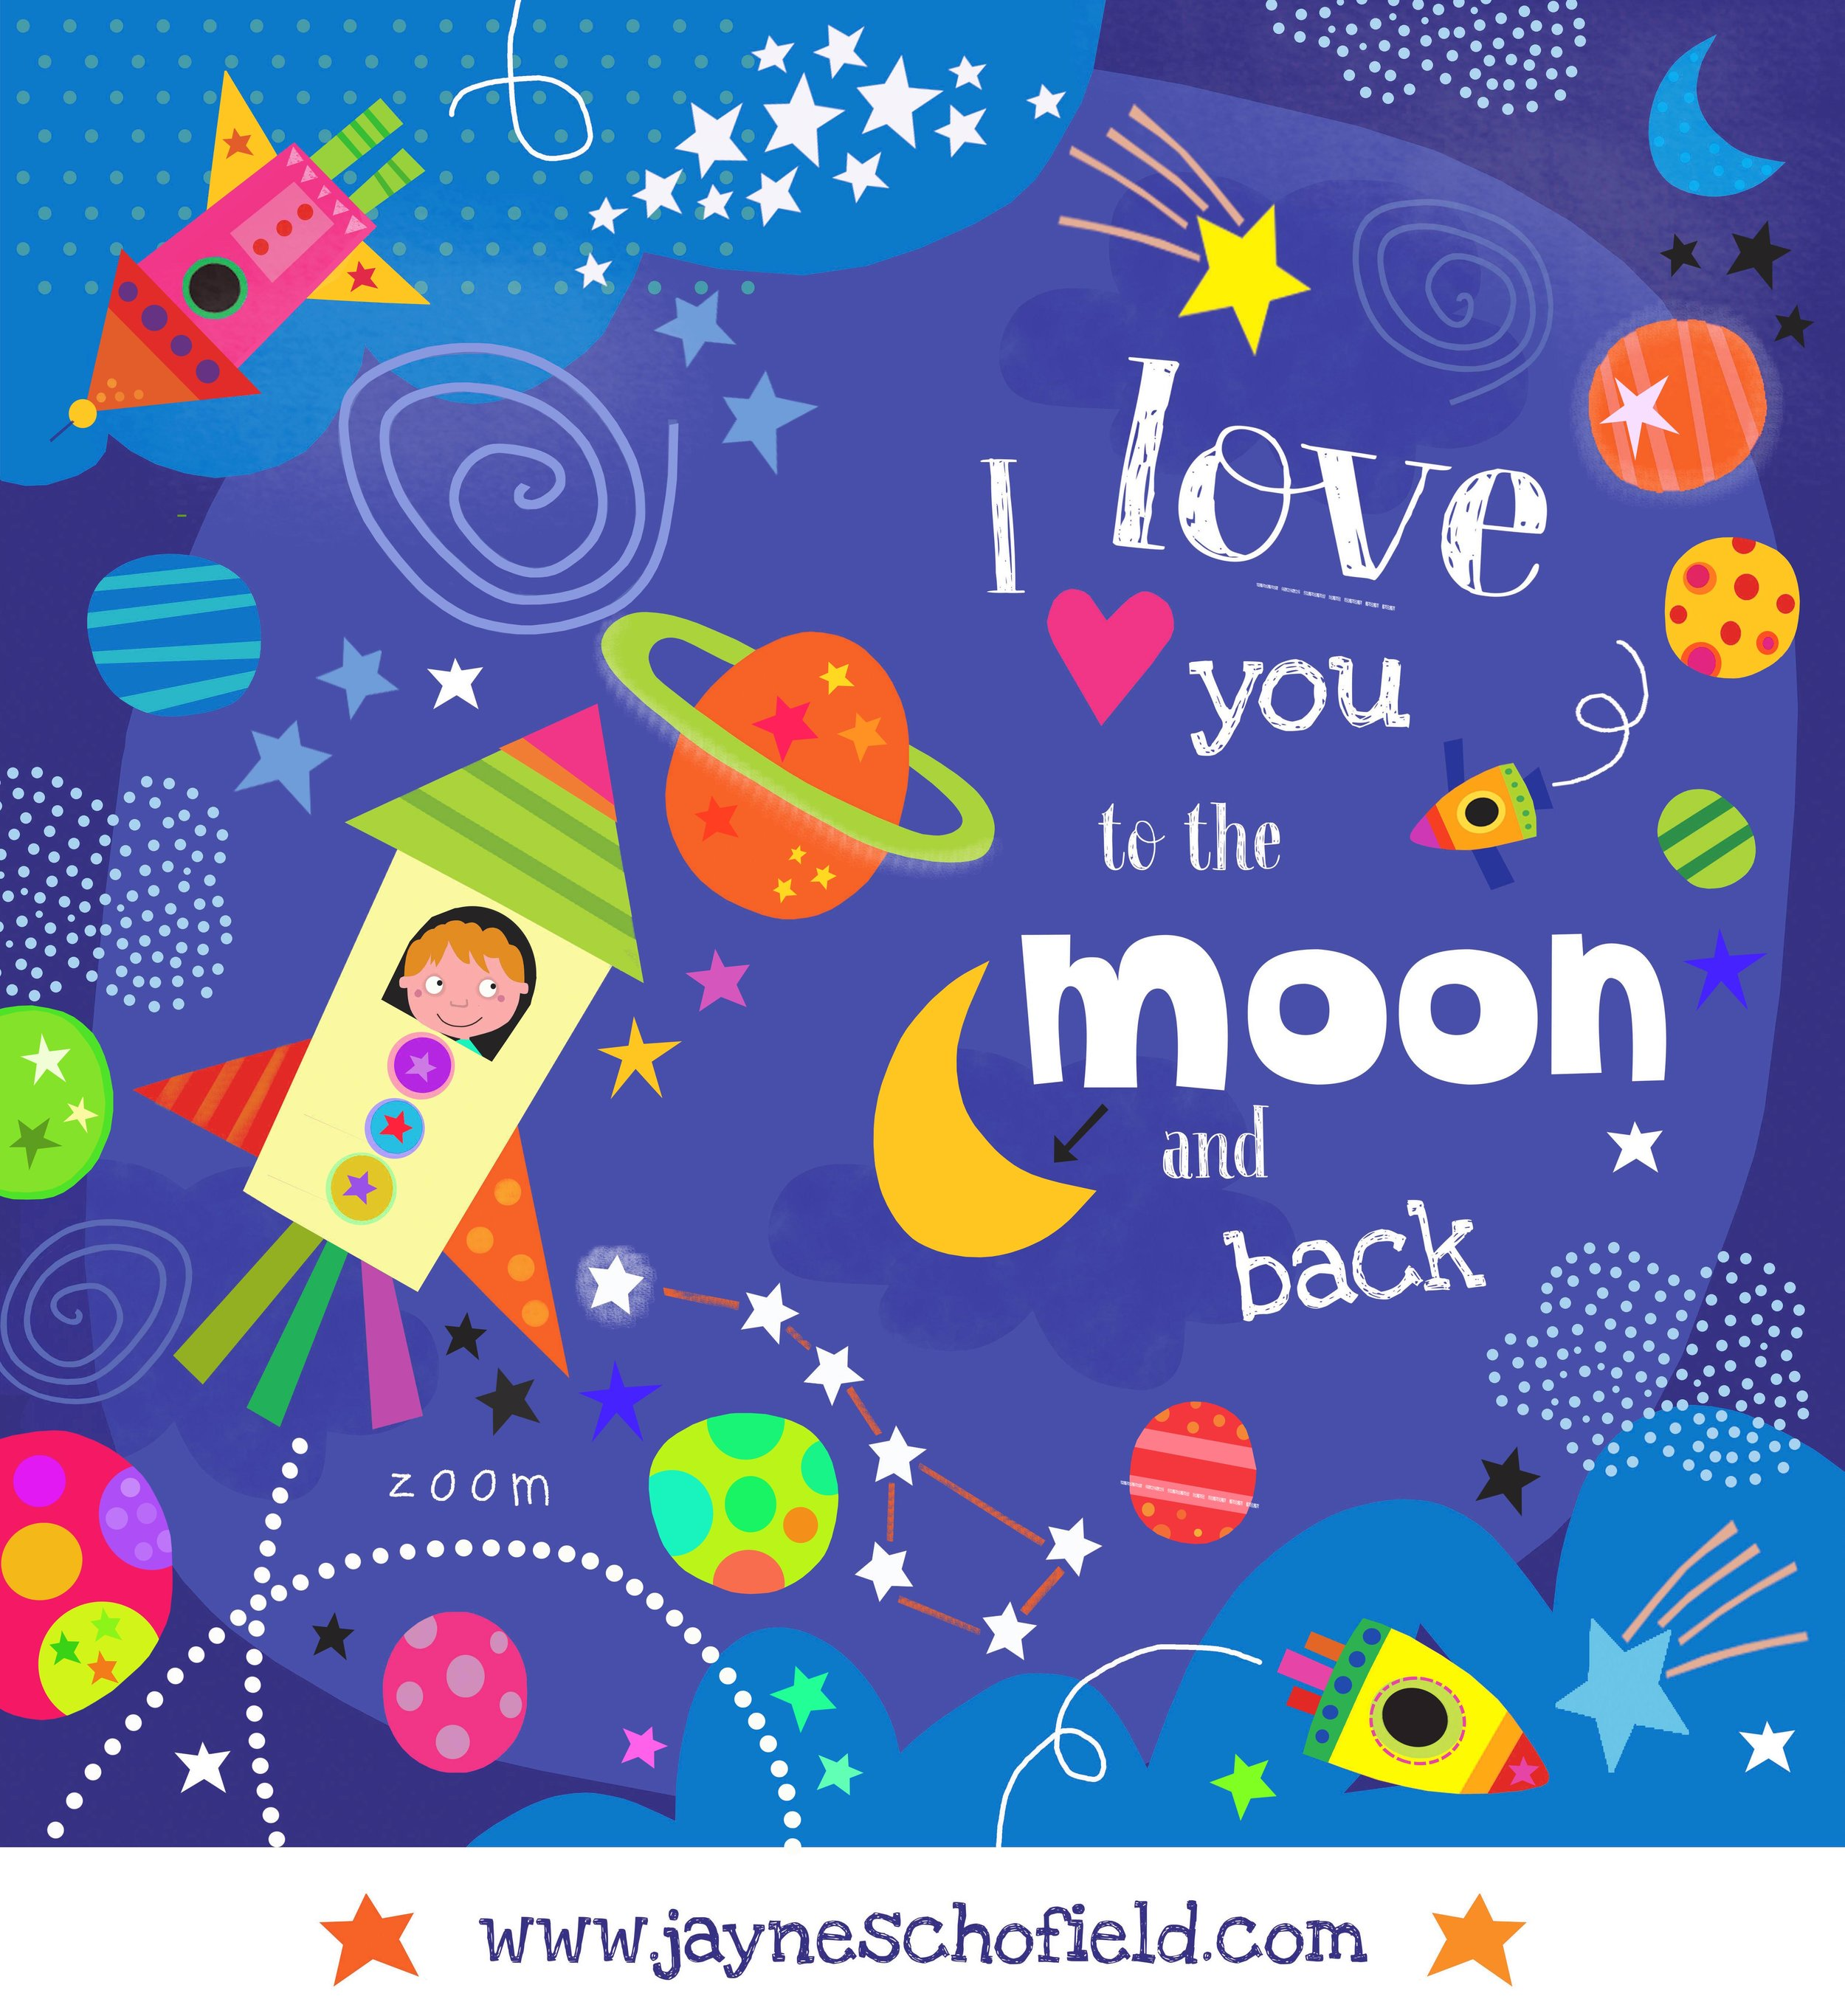 jayne schofield moon and back.jpg